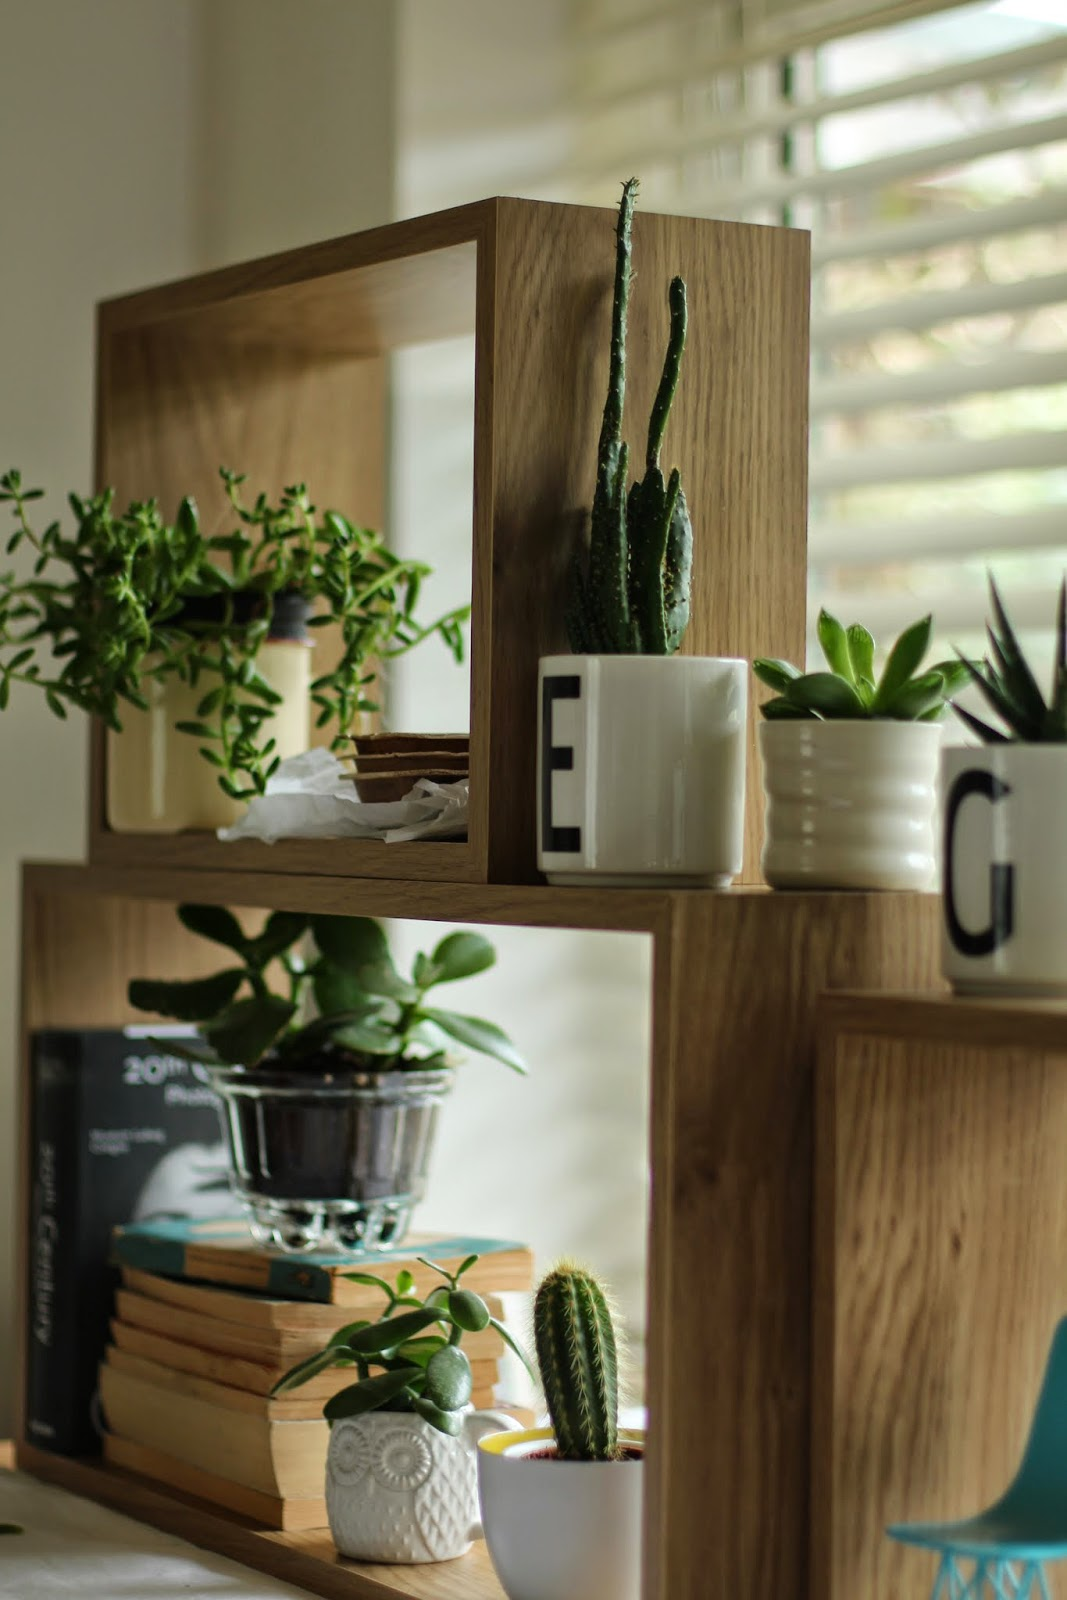 carolinedavis-stylist, trend-daily blog, #urbanjunglebloggers, plants, succulents